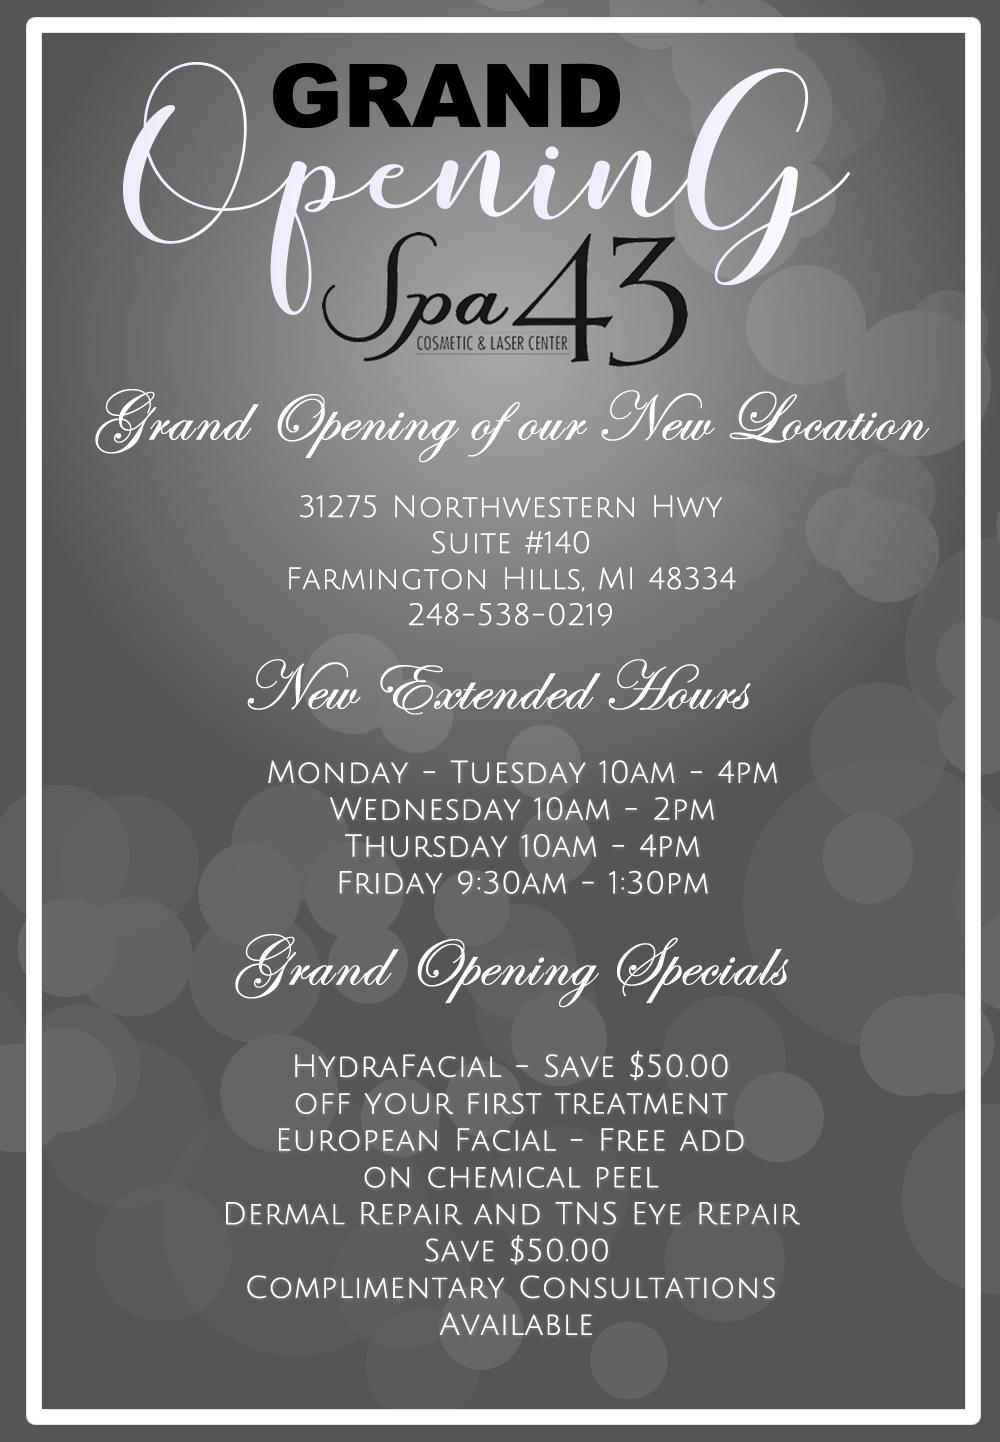 Specials and Events at Spa 43 Clinton Township, MI